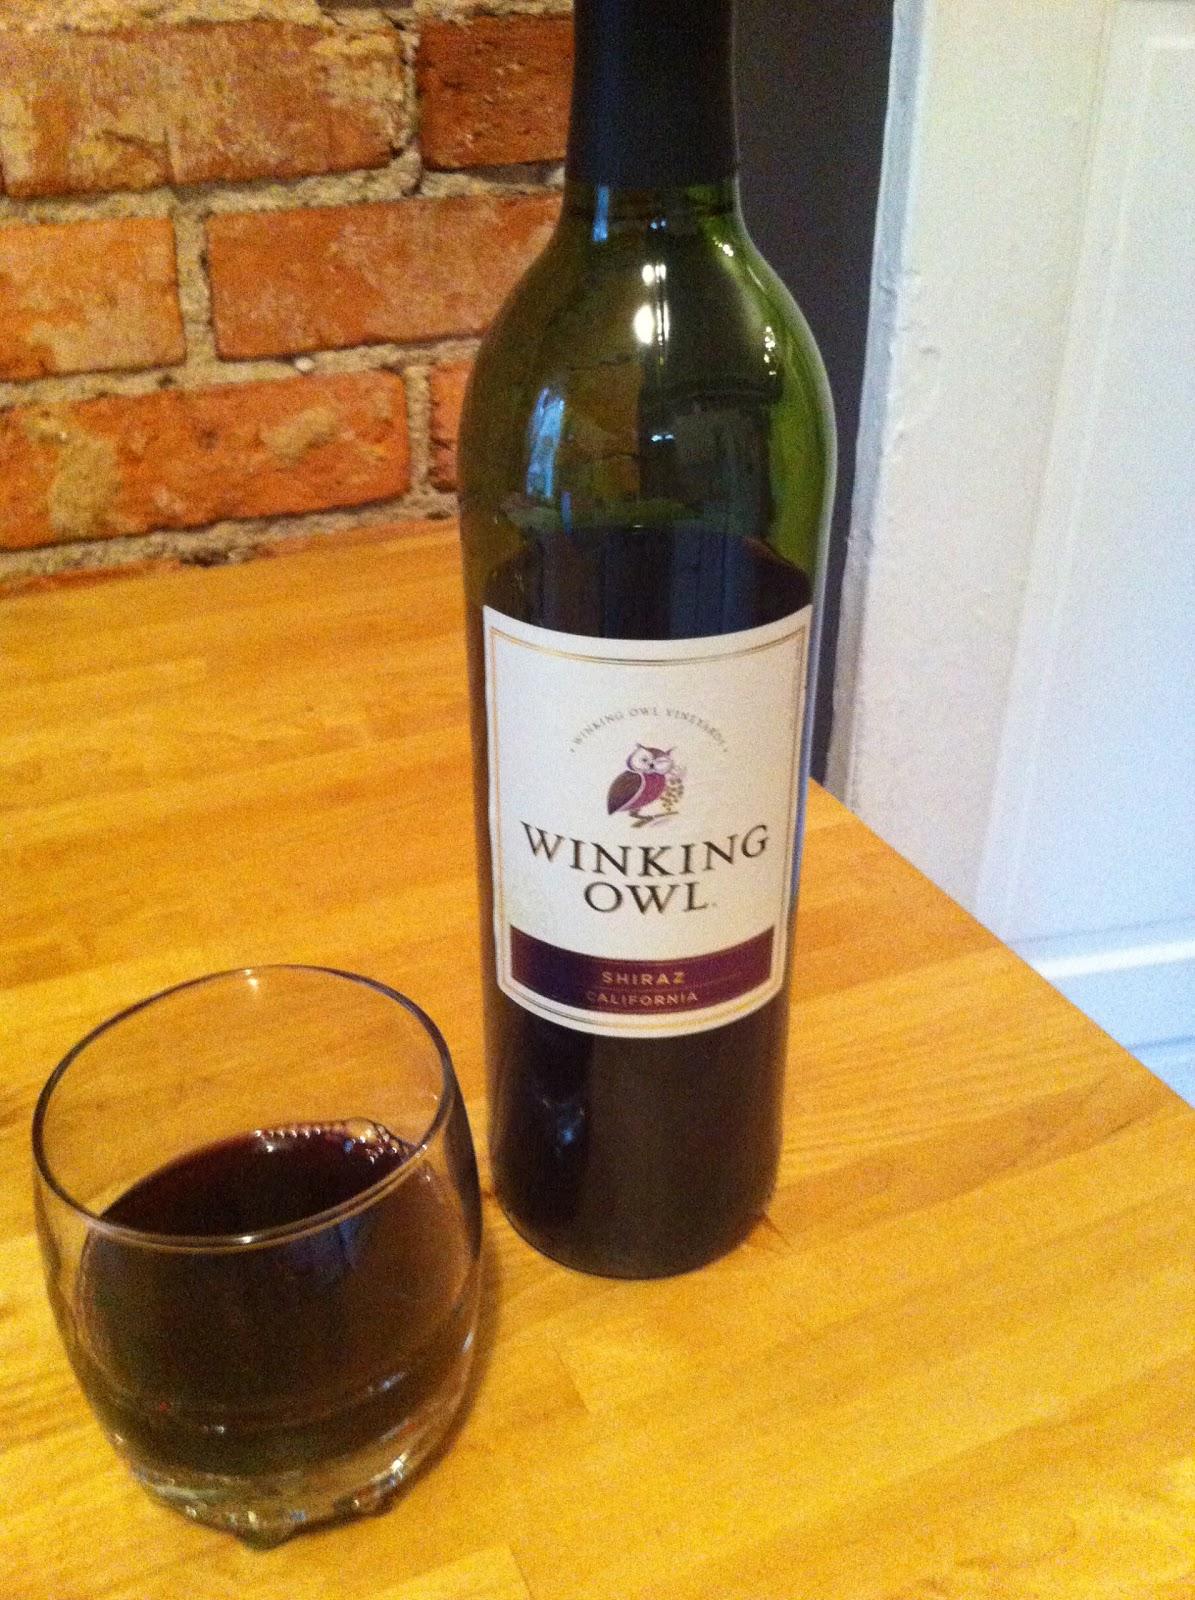 winking owl wine price